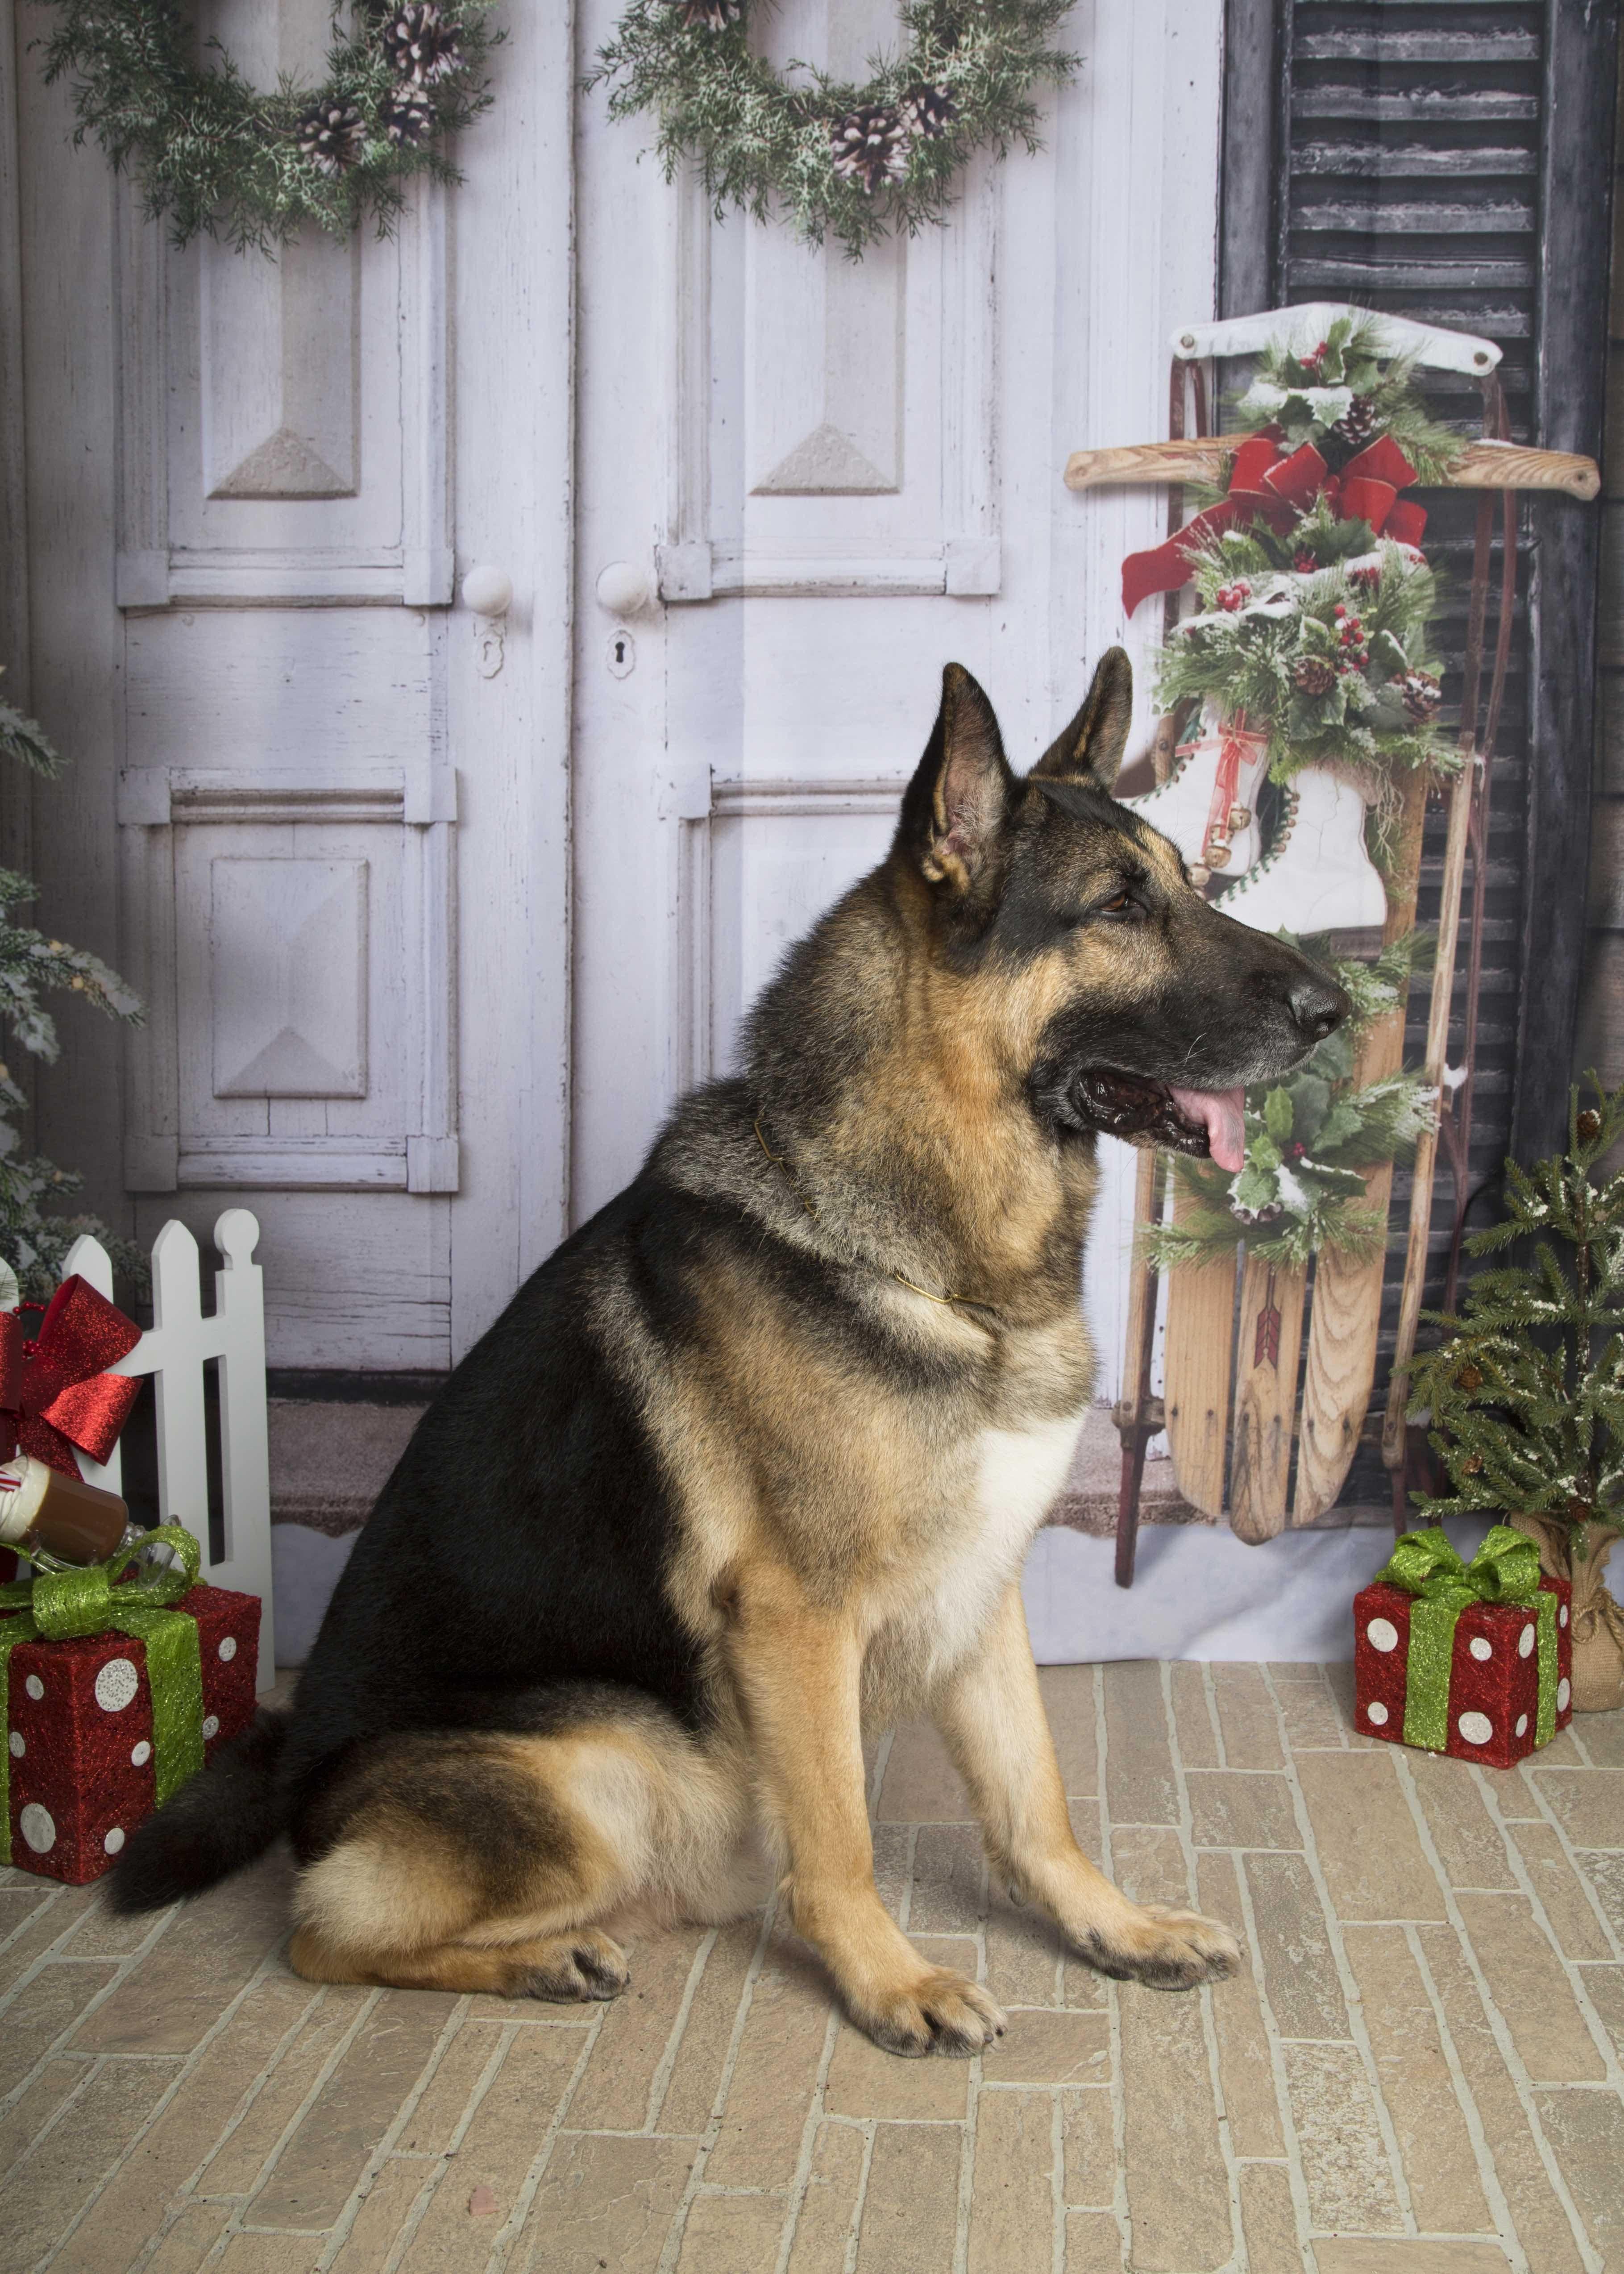 Pin By L Bank On German Shepherd German Shepherd Dogs Christmas